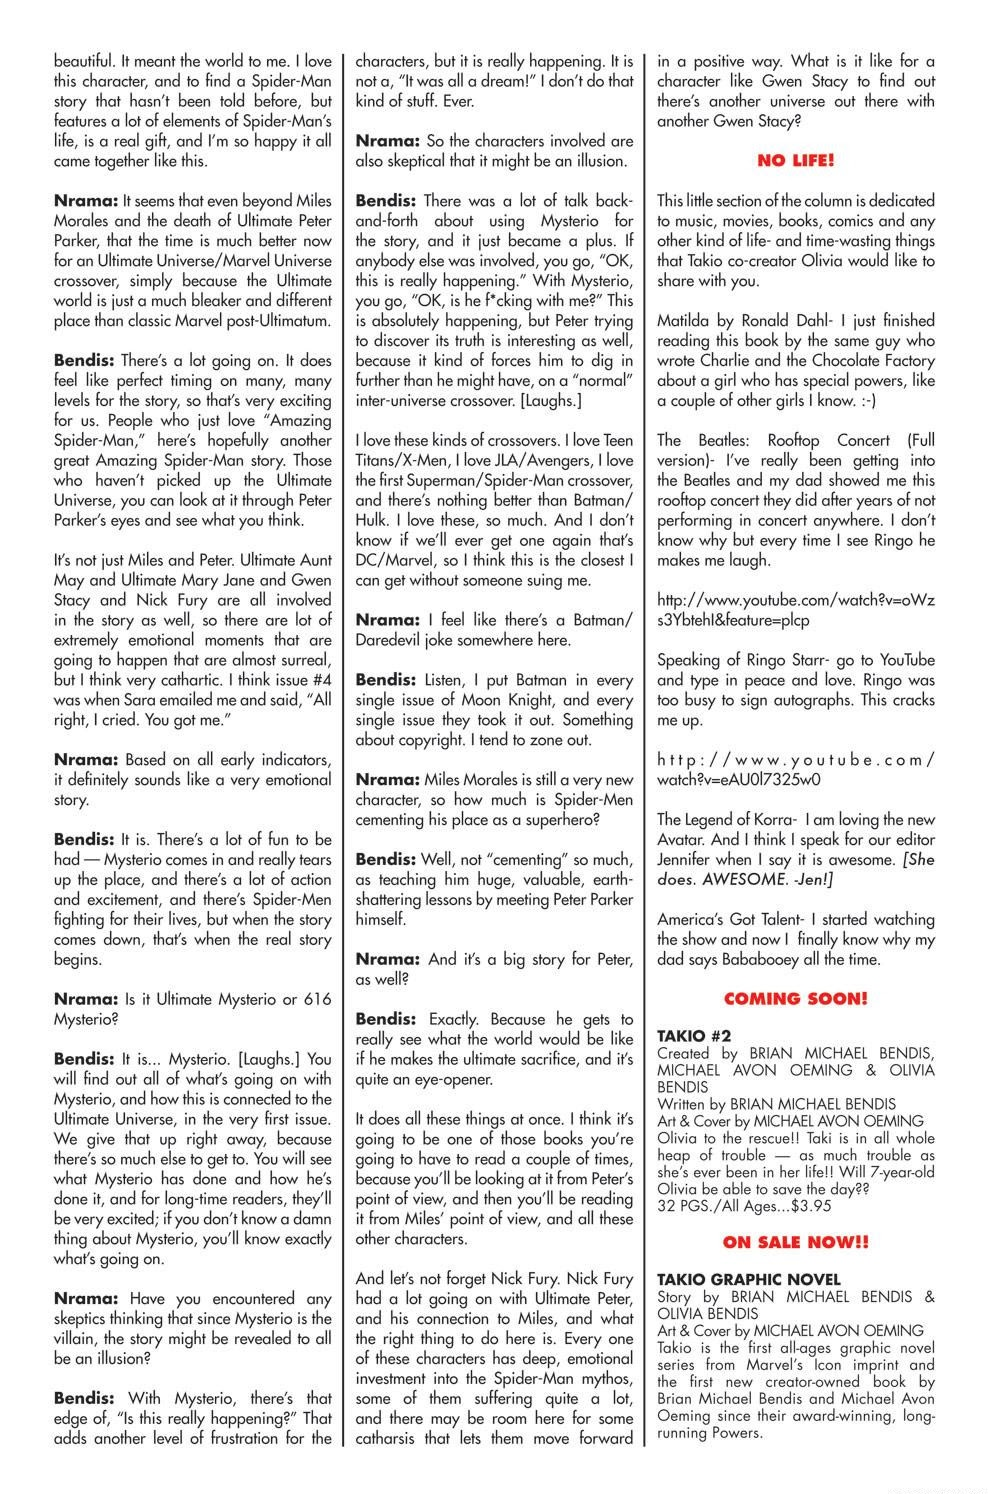 Read online Takio (2012) comic -  Issue #2 - 29